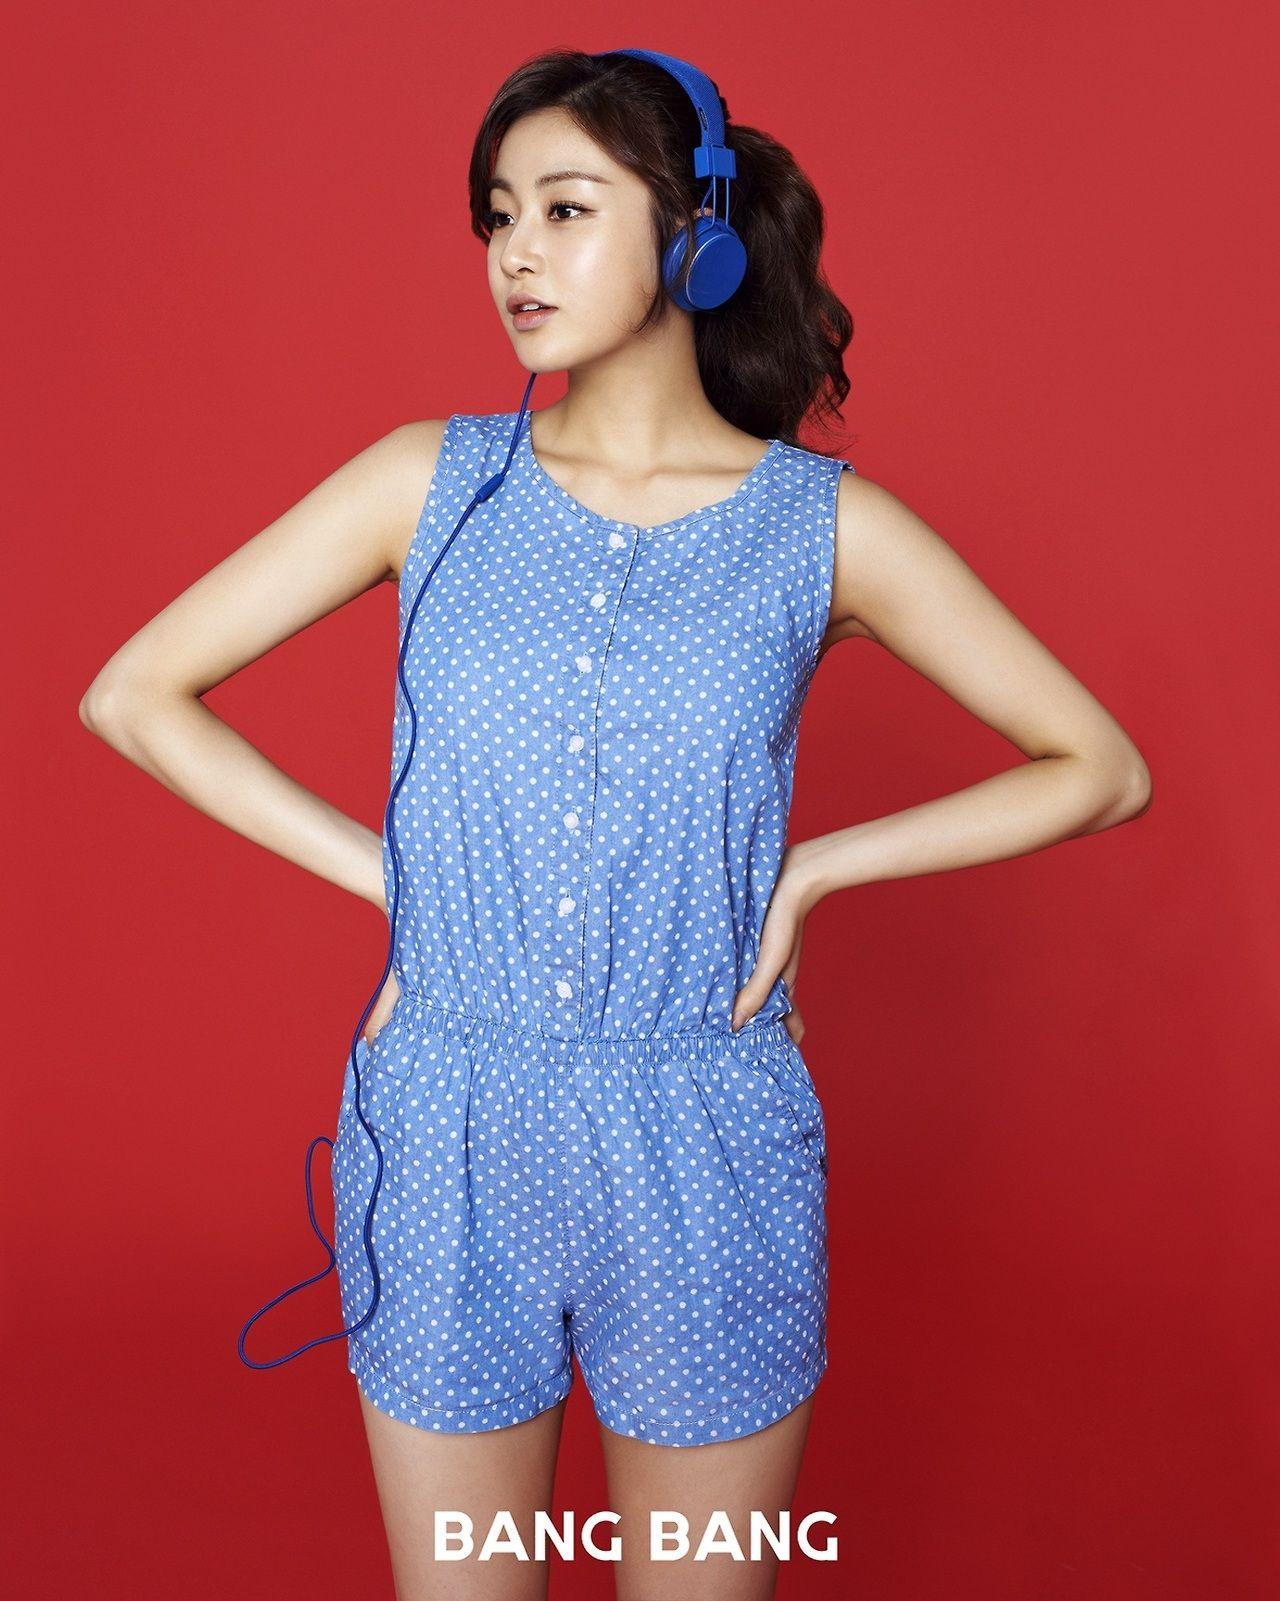 Pin on Actress Kang So-Ra 강소라